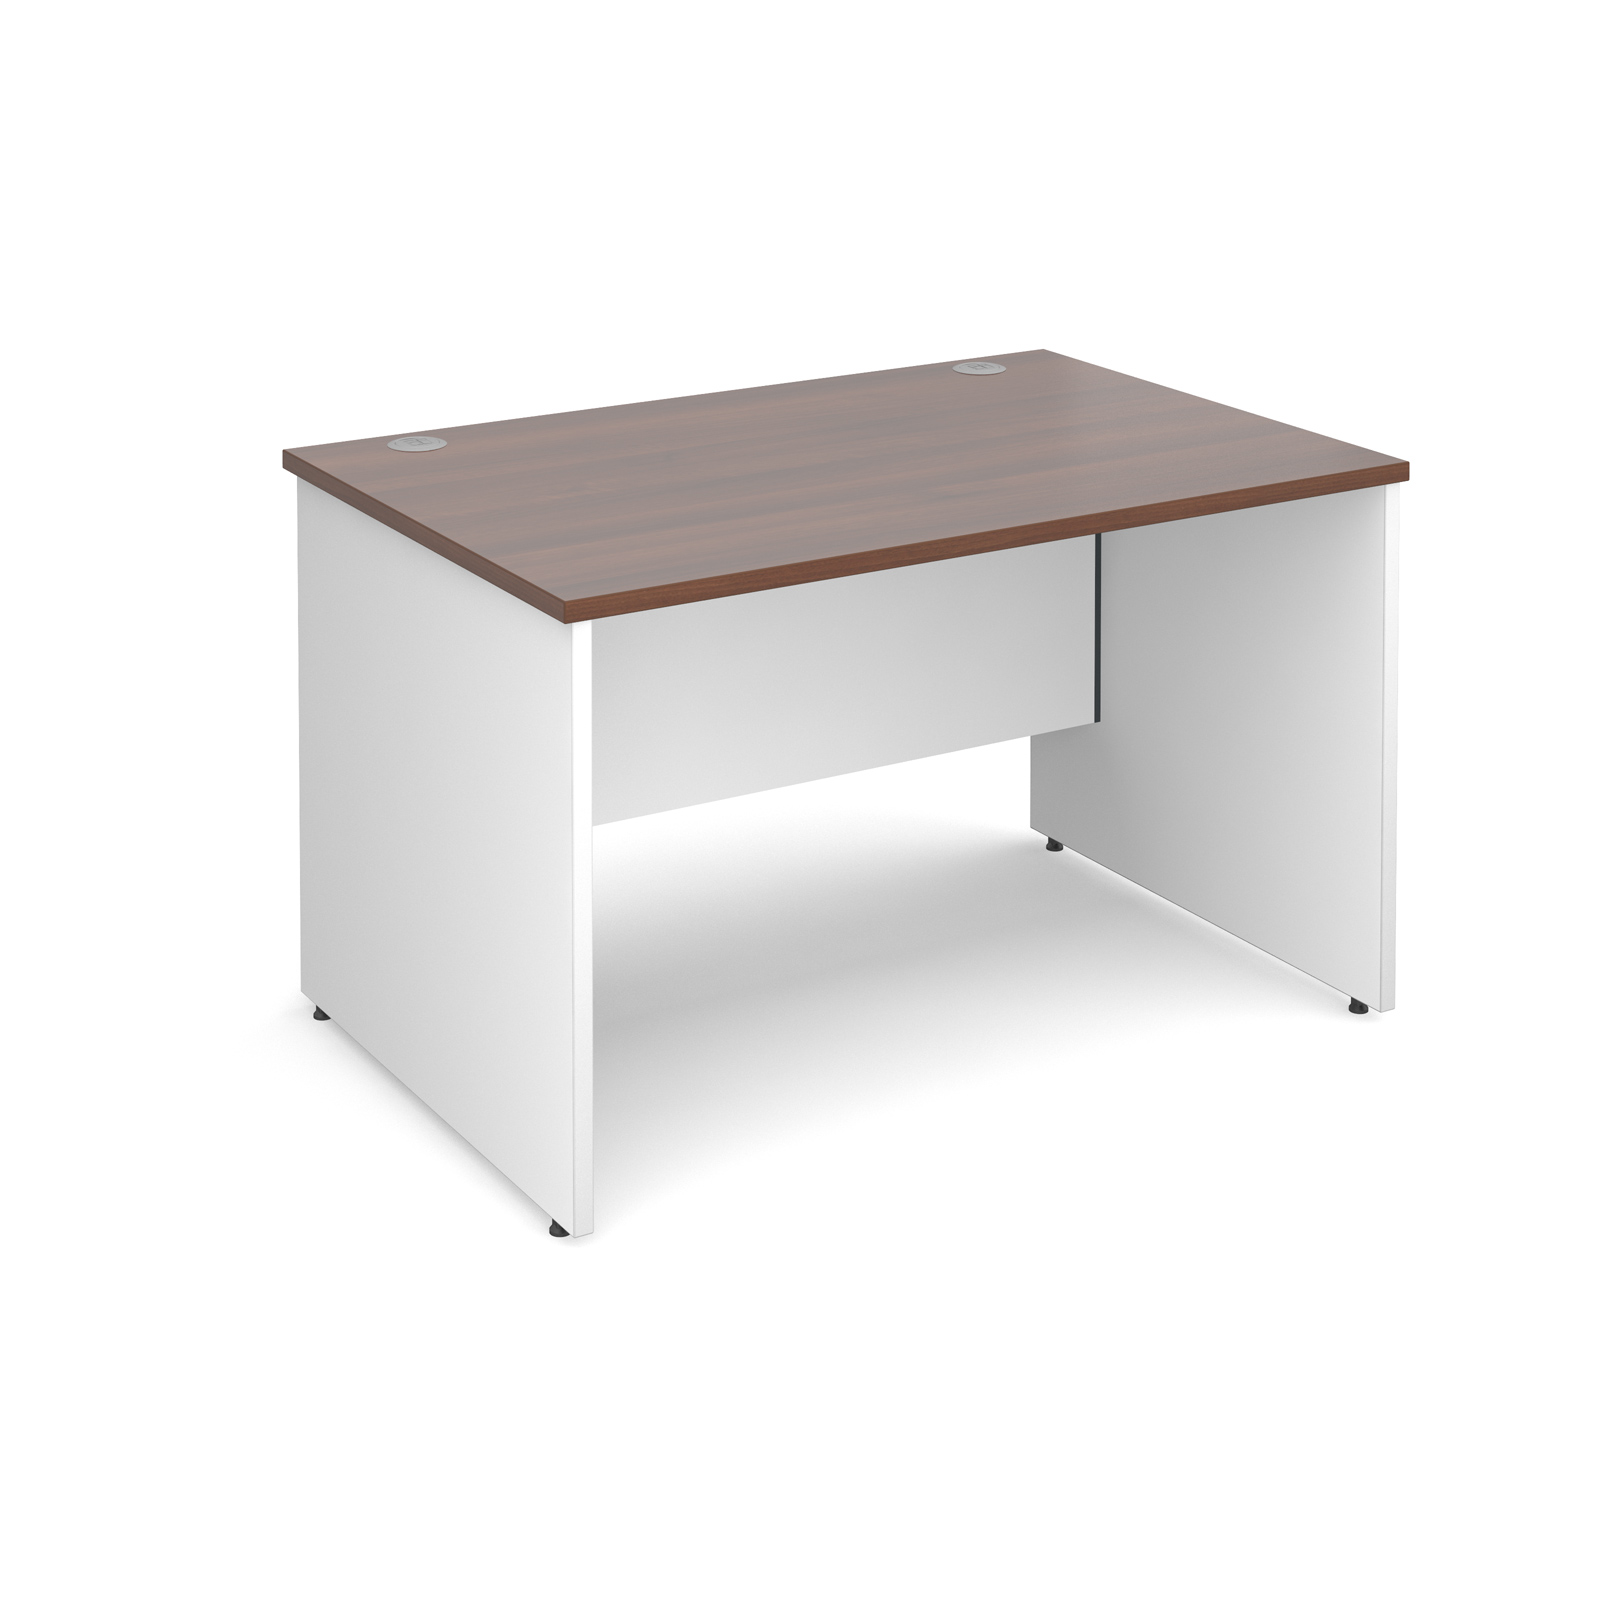 Duo Straight Desk 1200mm x 800mm - White Panel Leg, Walnut Top